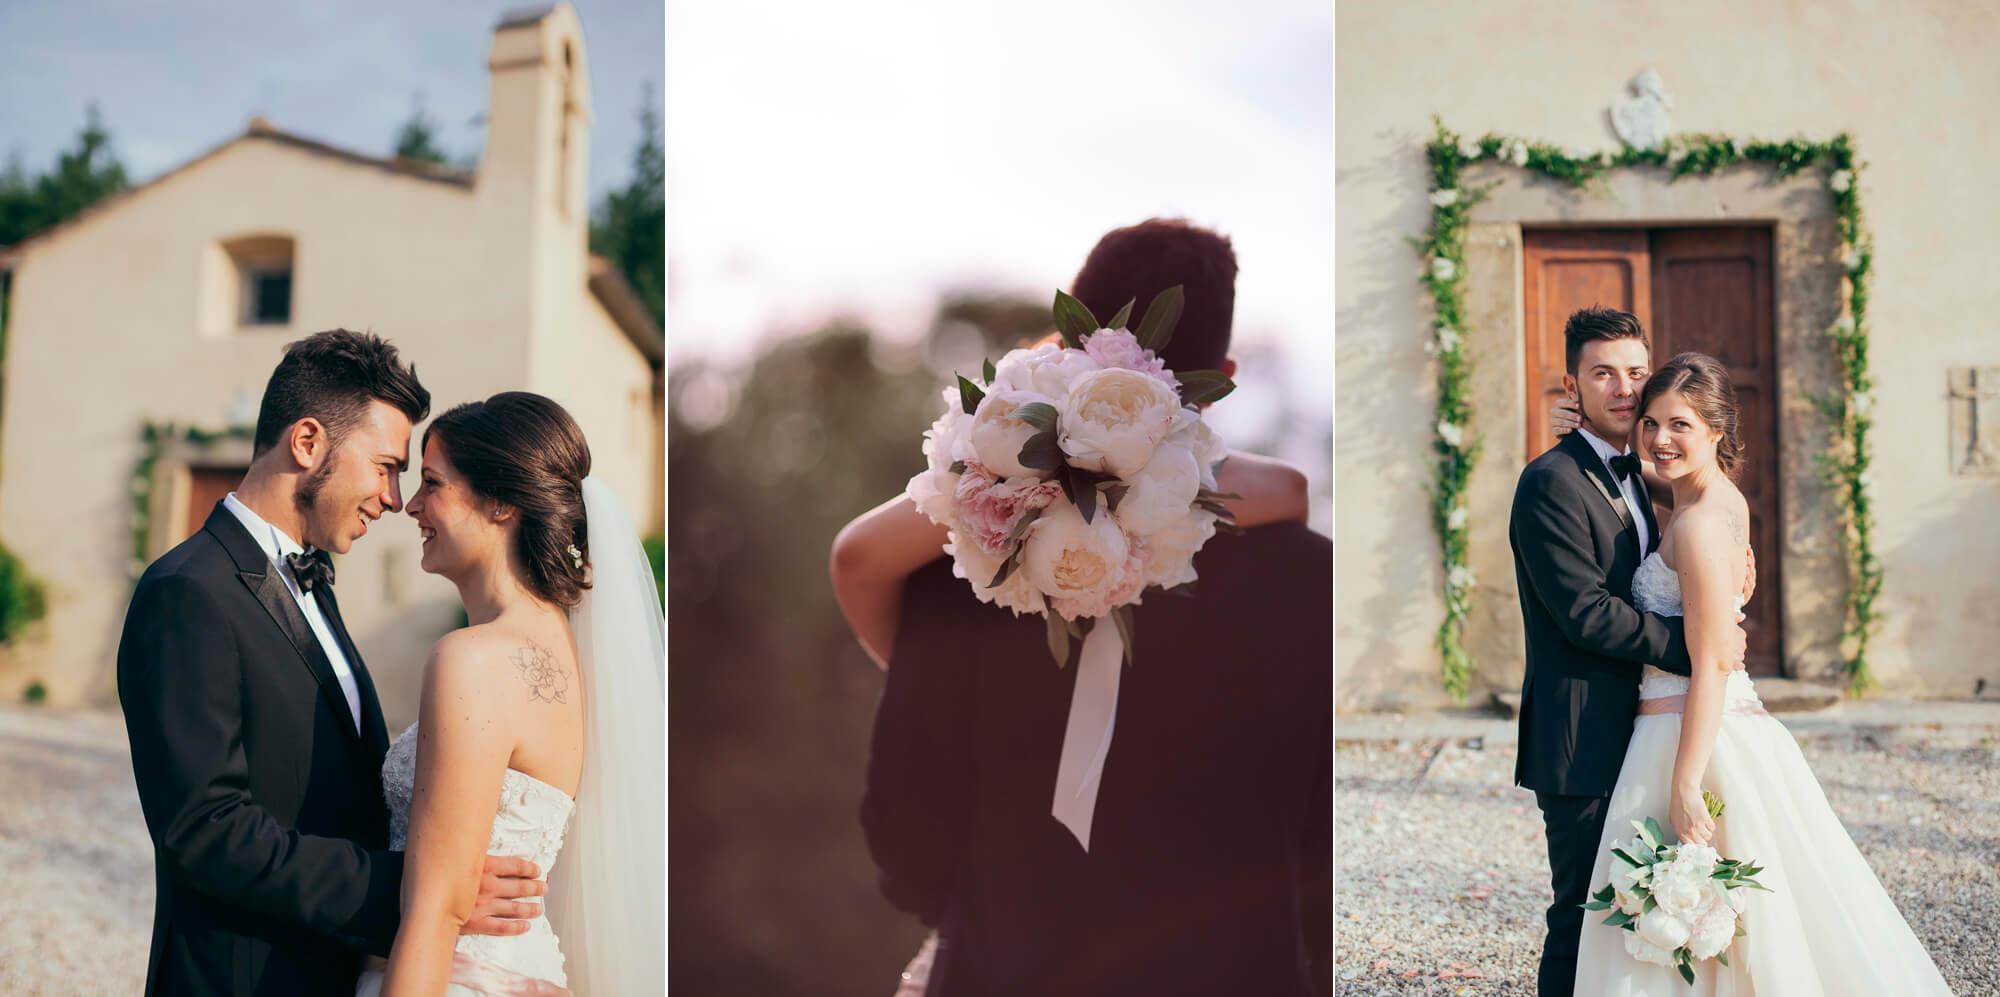 076-arezzo-wedding-photographer.jpg